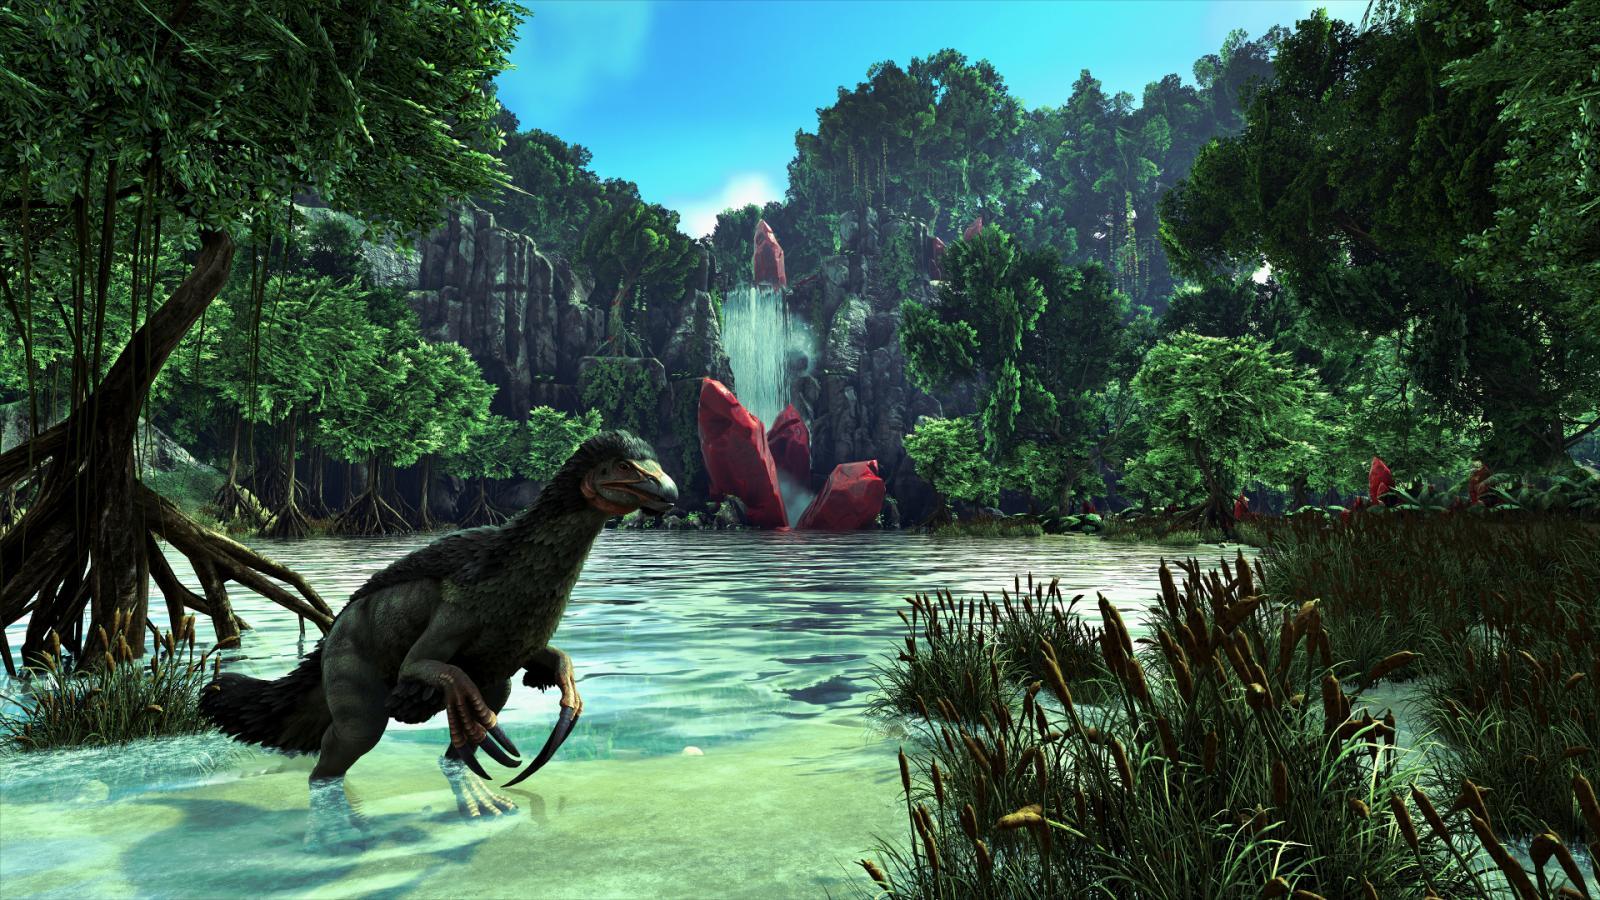 large.58e84b977bf75_WolfAngelus-RainforestAdventures-8xsta.jpg